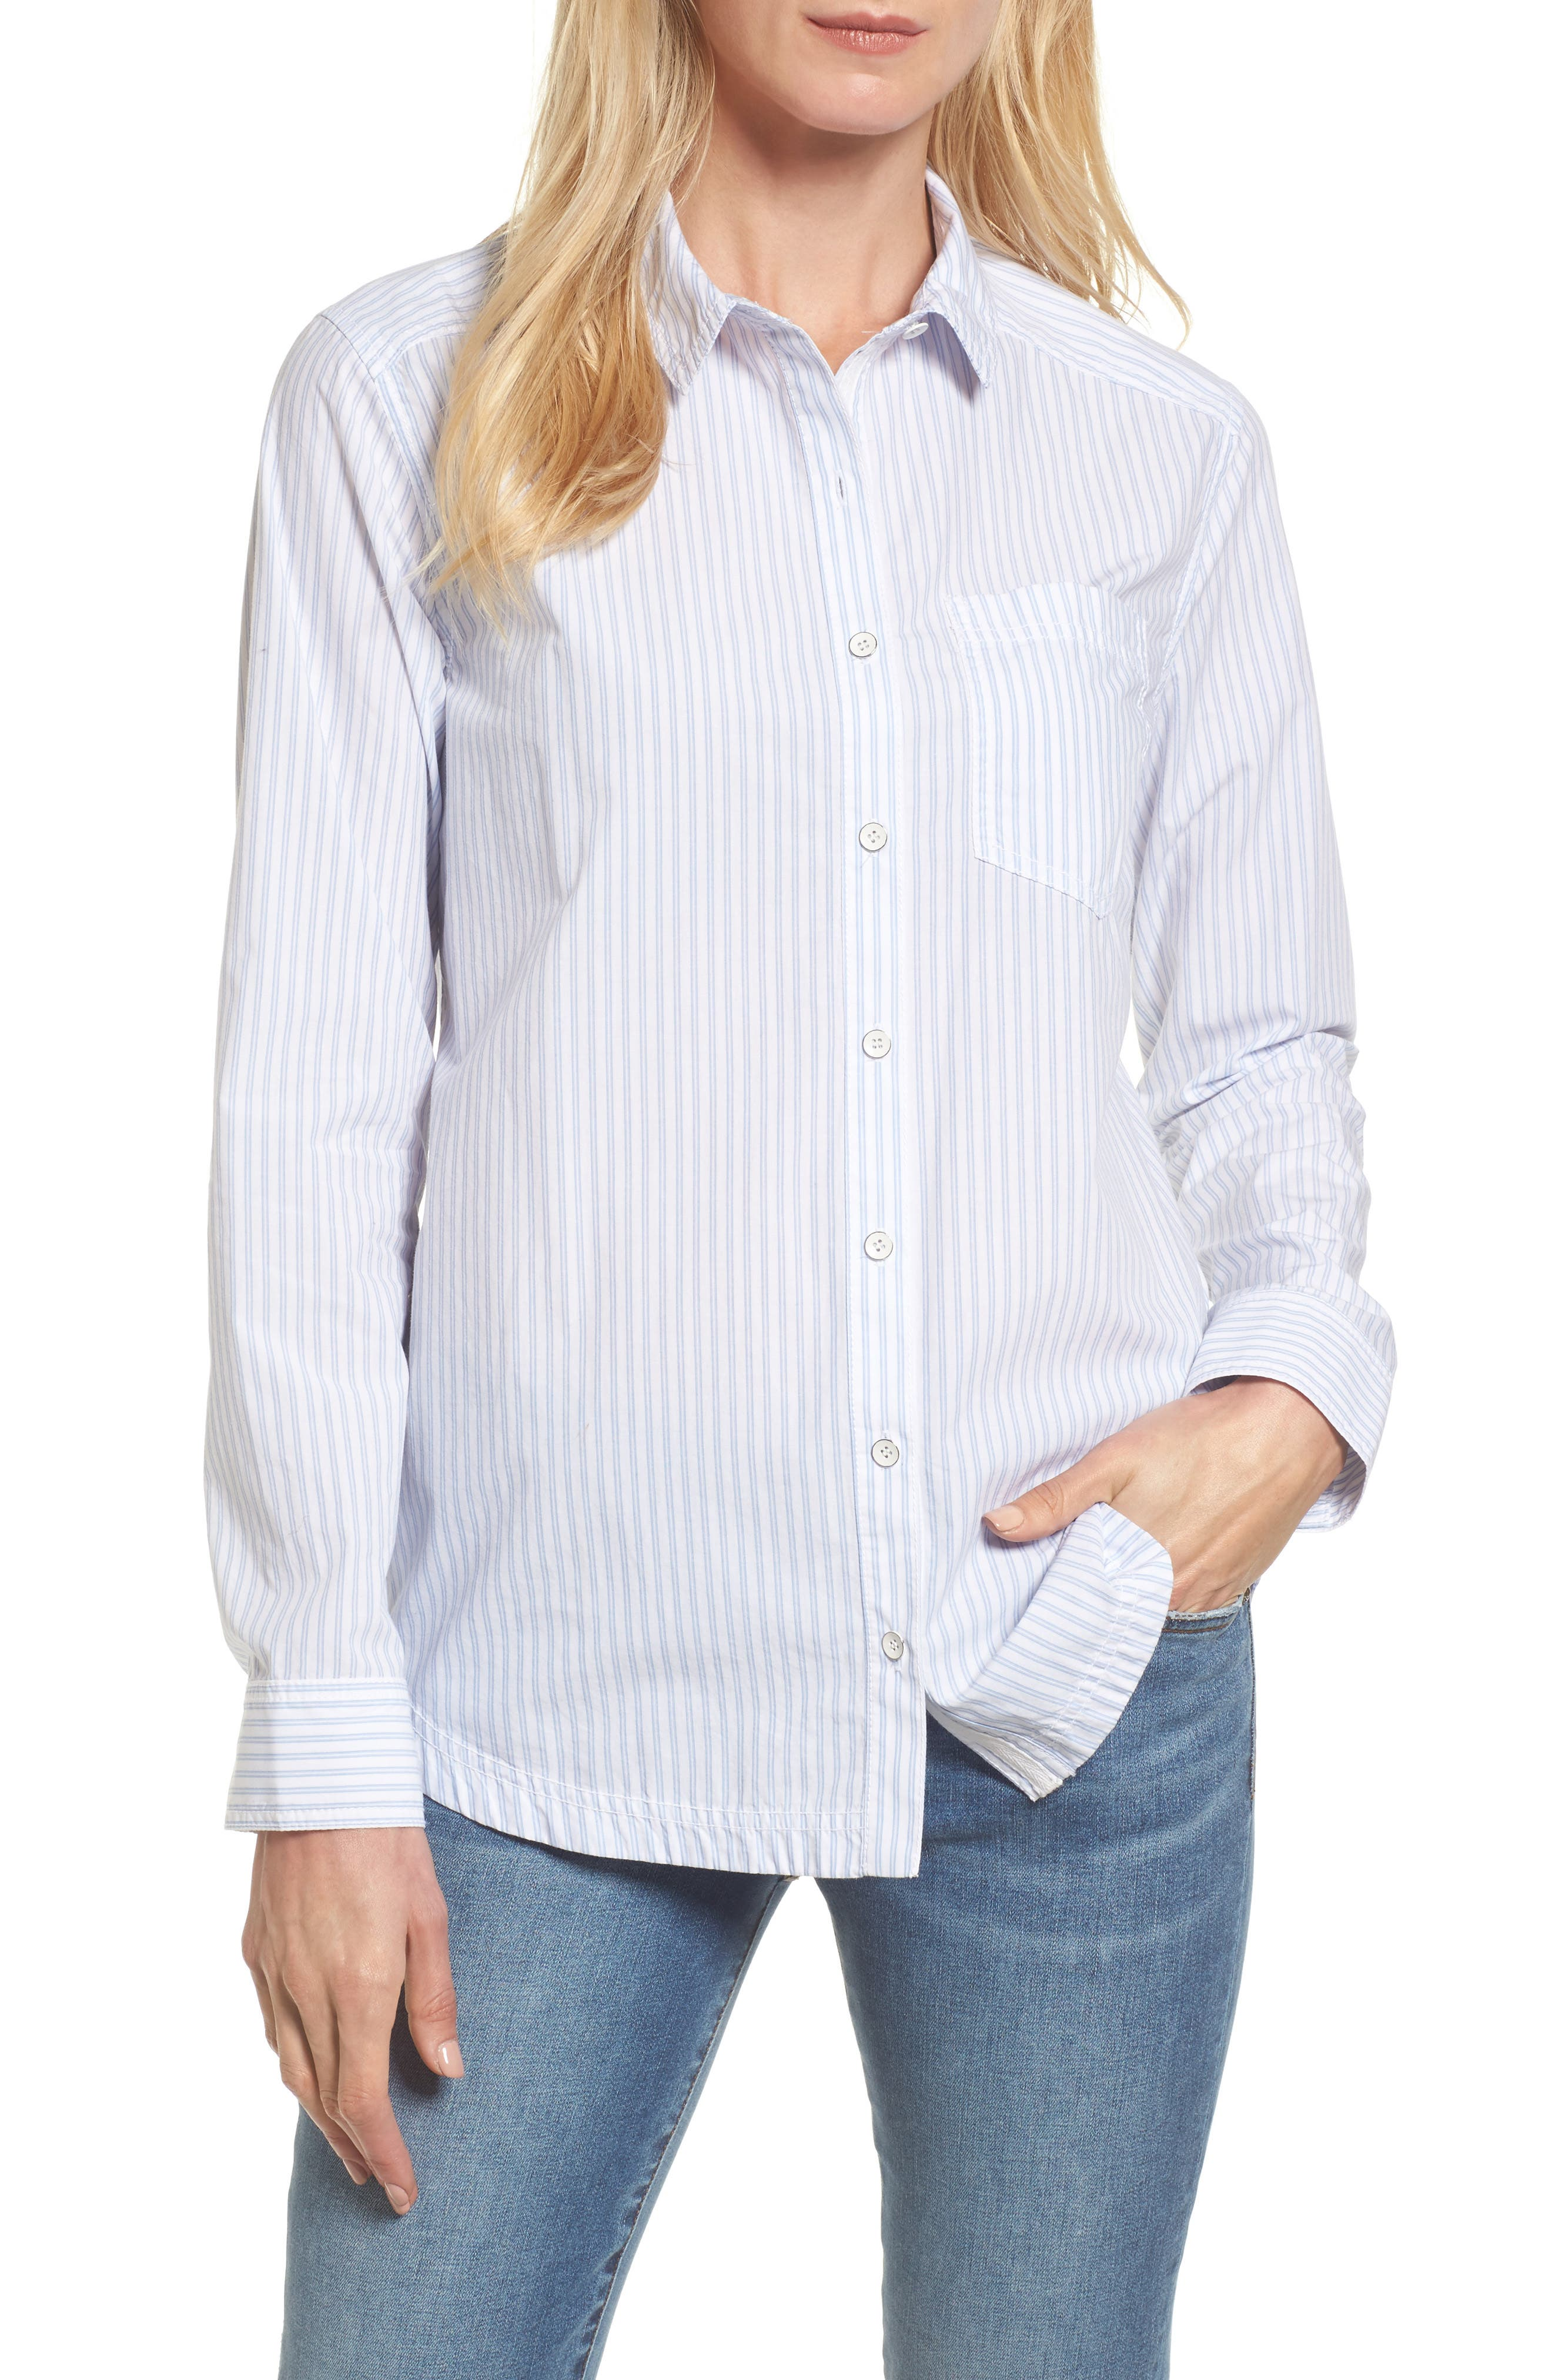 Alternate Image 1 Selected - Caslon® Button Front Pocket Shirt (Regular & Petite)